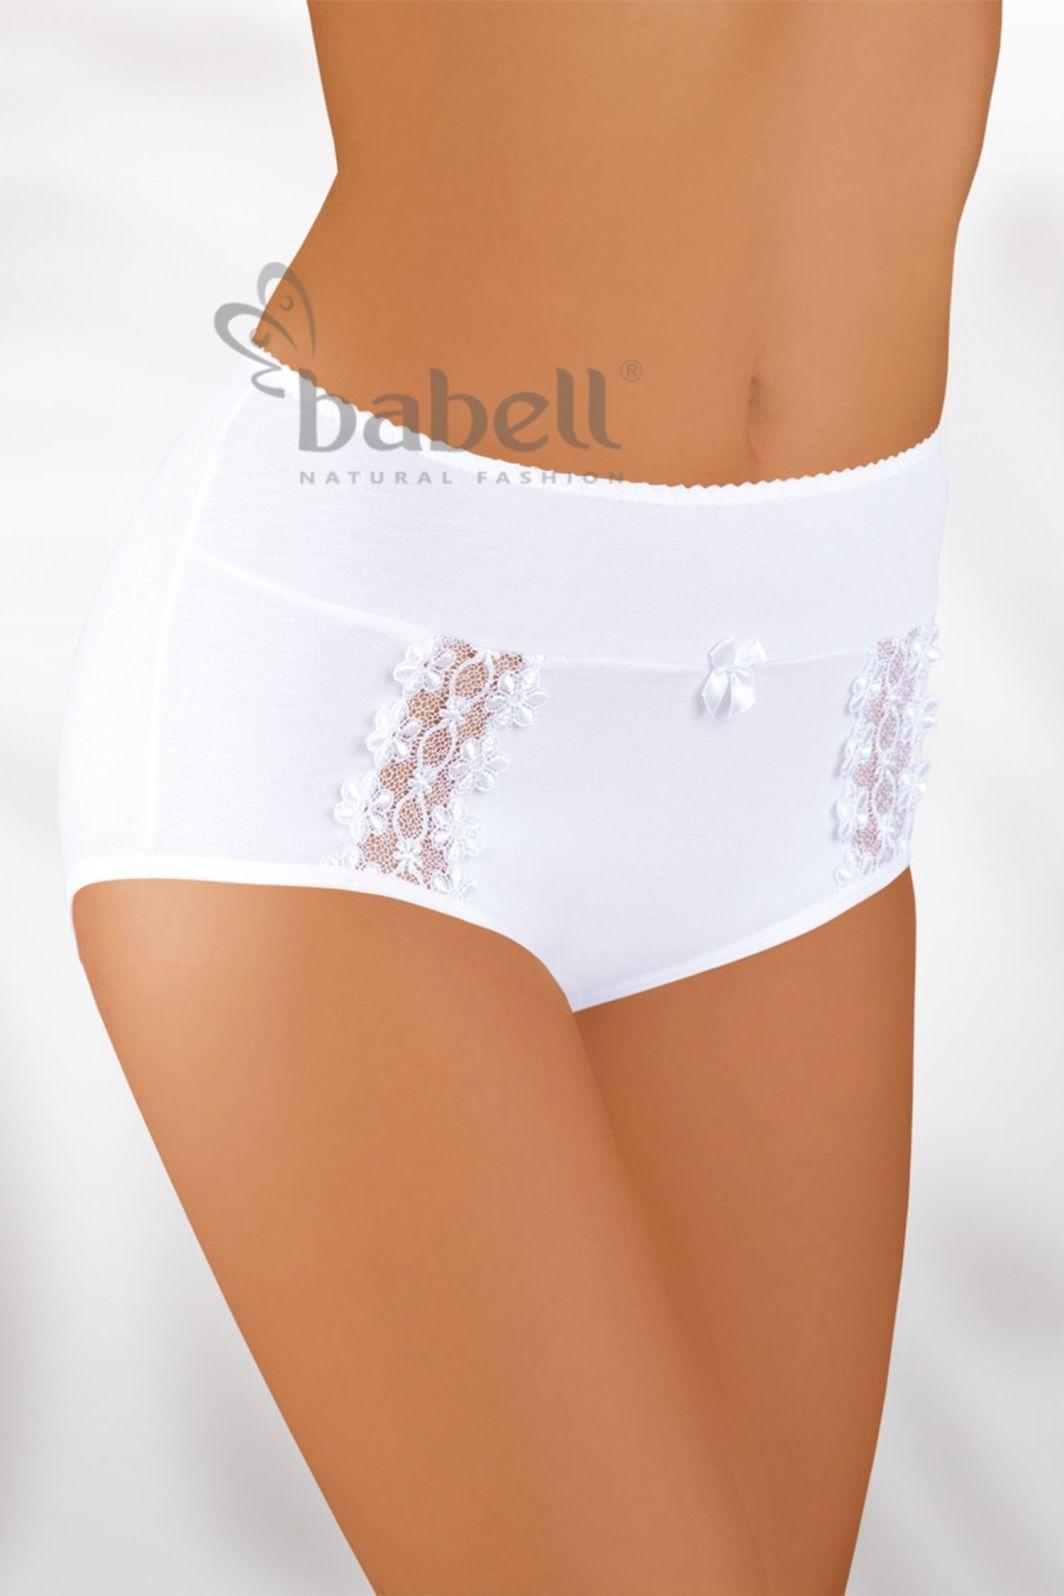 Babell Figi damskie BBL-005 białe r. M 1